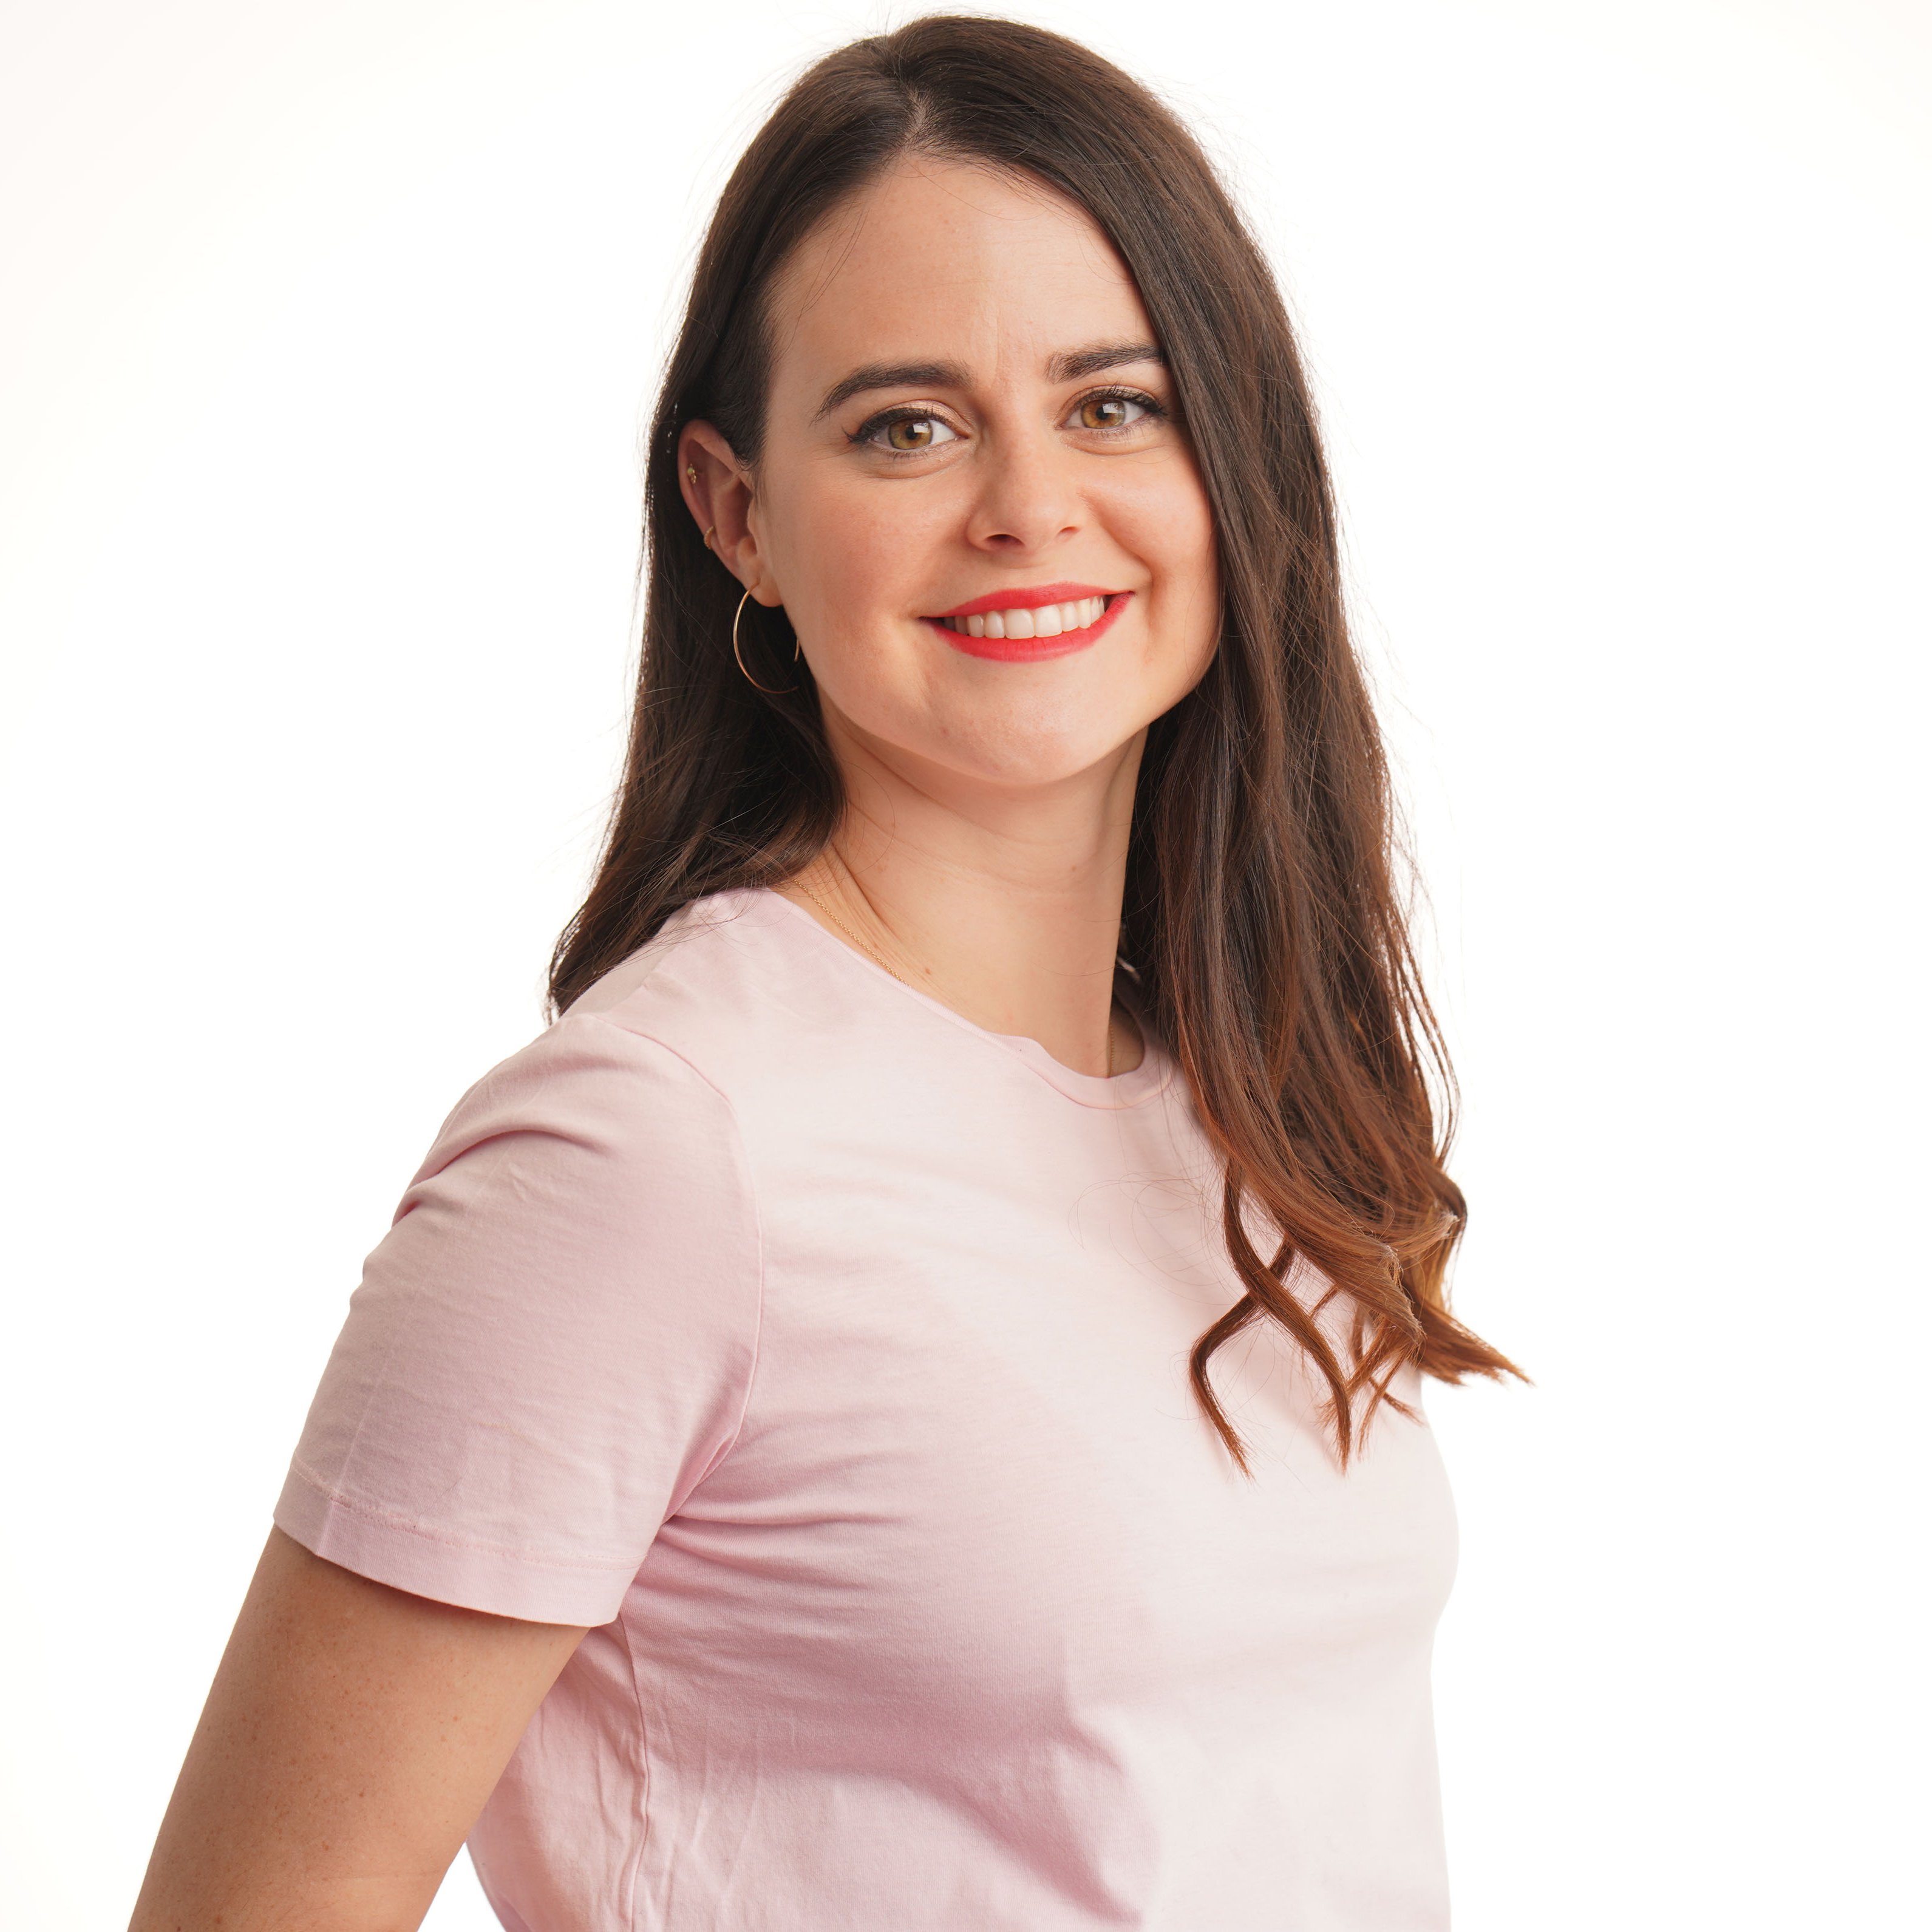 DANIELLE GRANT - Senior Marketing Manager, Consume